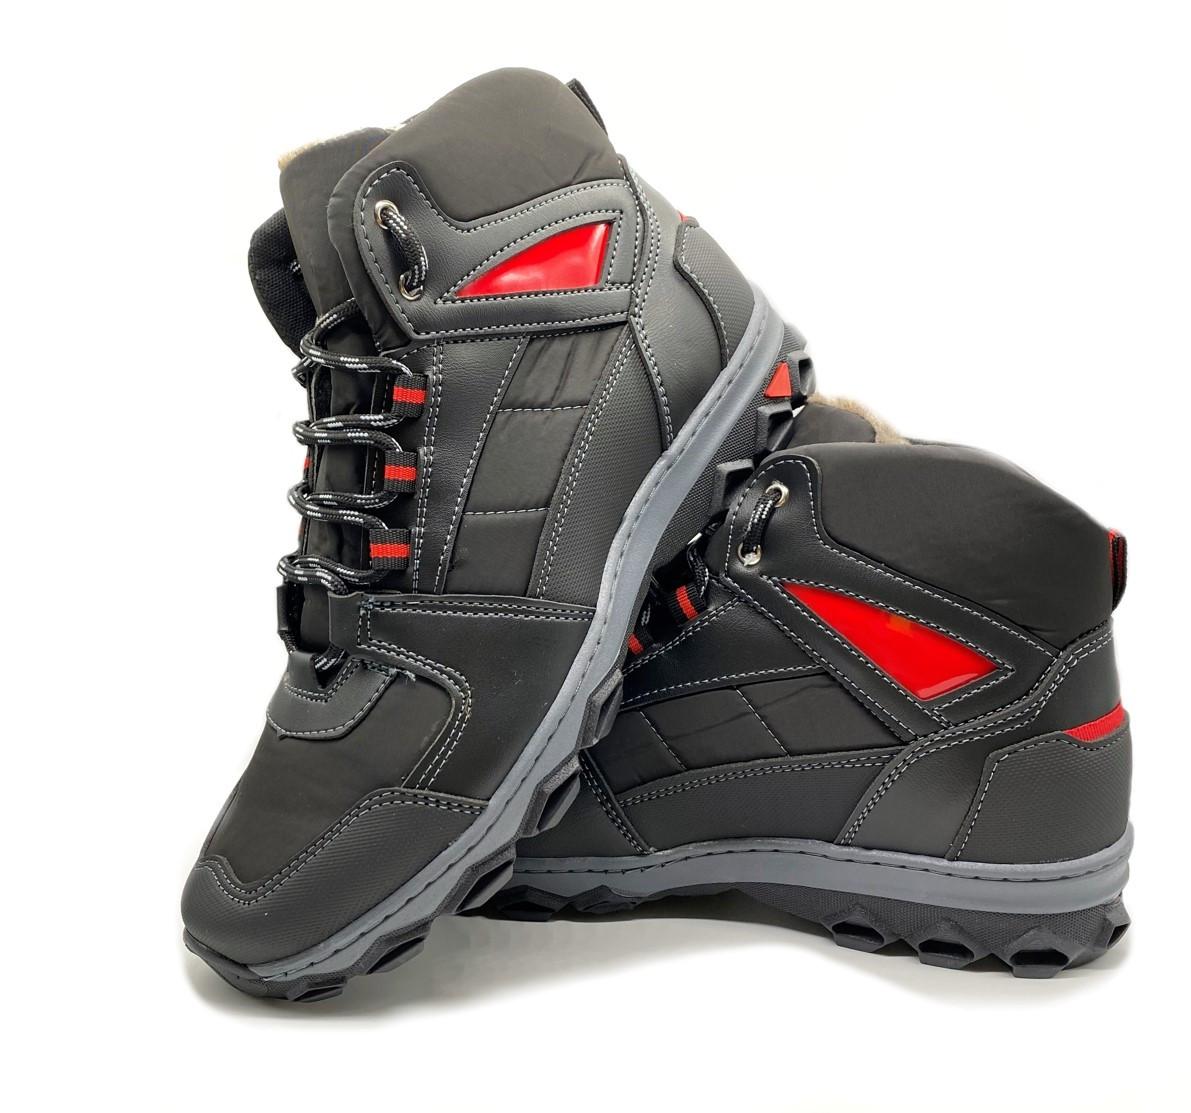 Мужские ботинки зимние прошитые на меху 41 размер